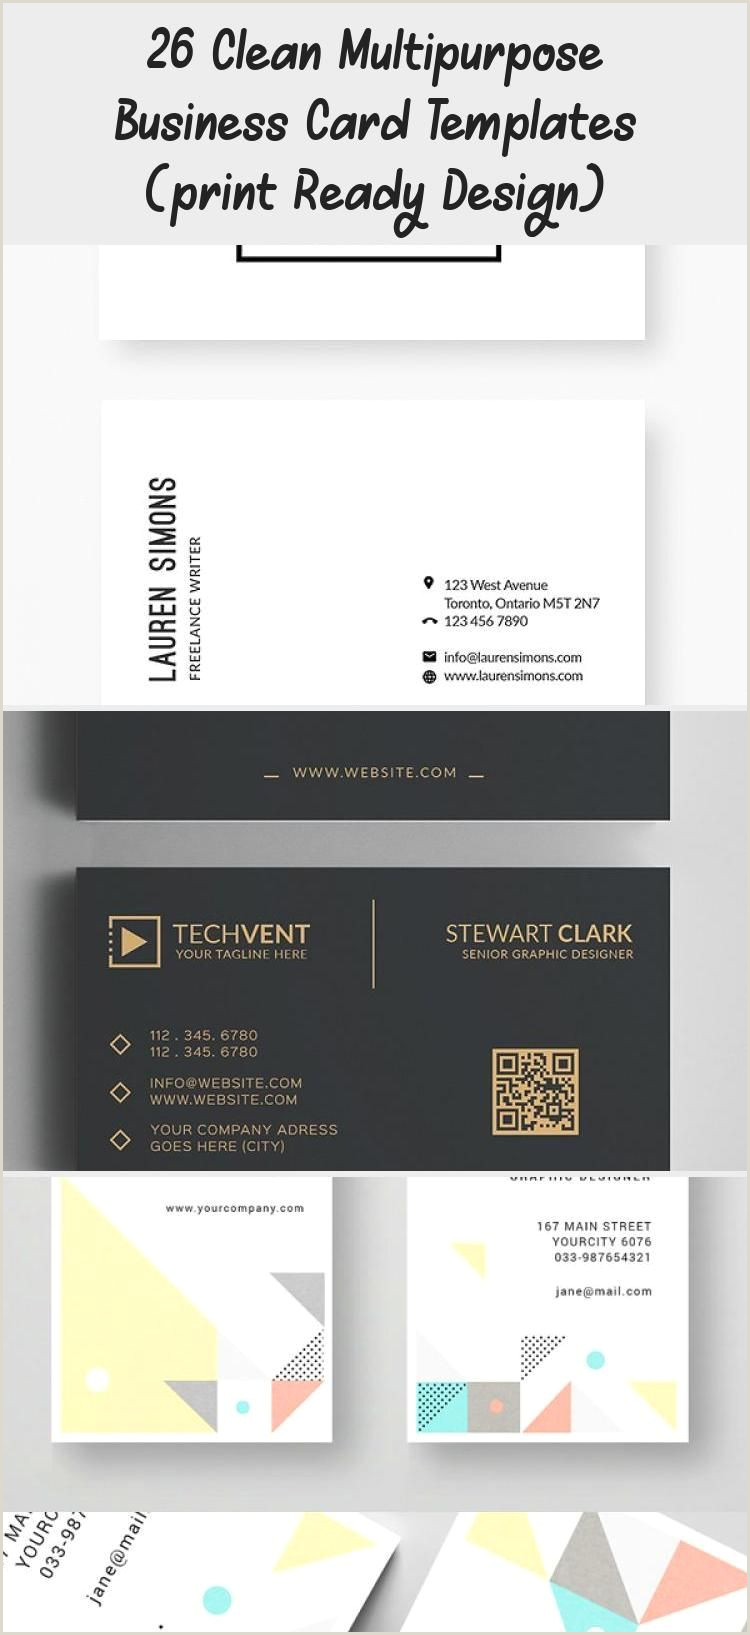 Business Card Pinterest 26 Clean Multipurpose Business Card Templates Print Ready